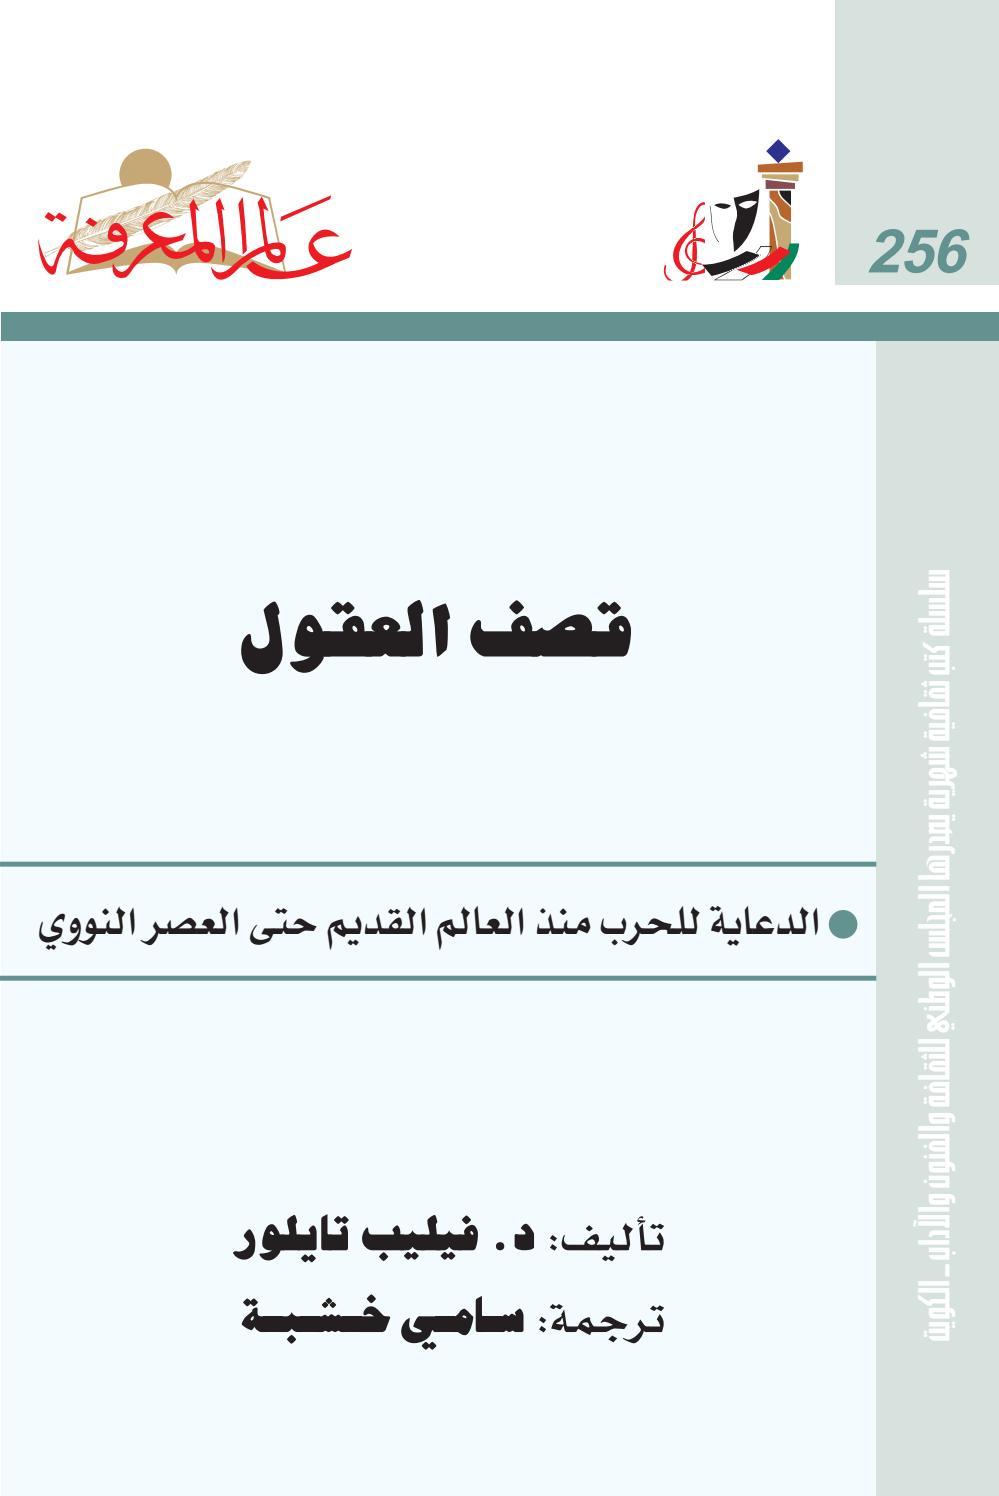 fe9312eb4d3d3 256 قصف العقول by iReadPedia - issuu